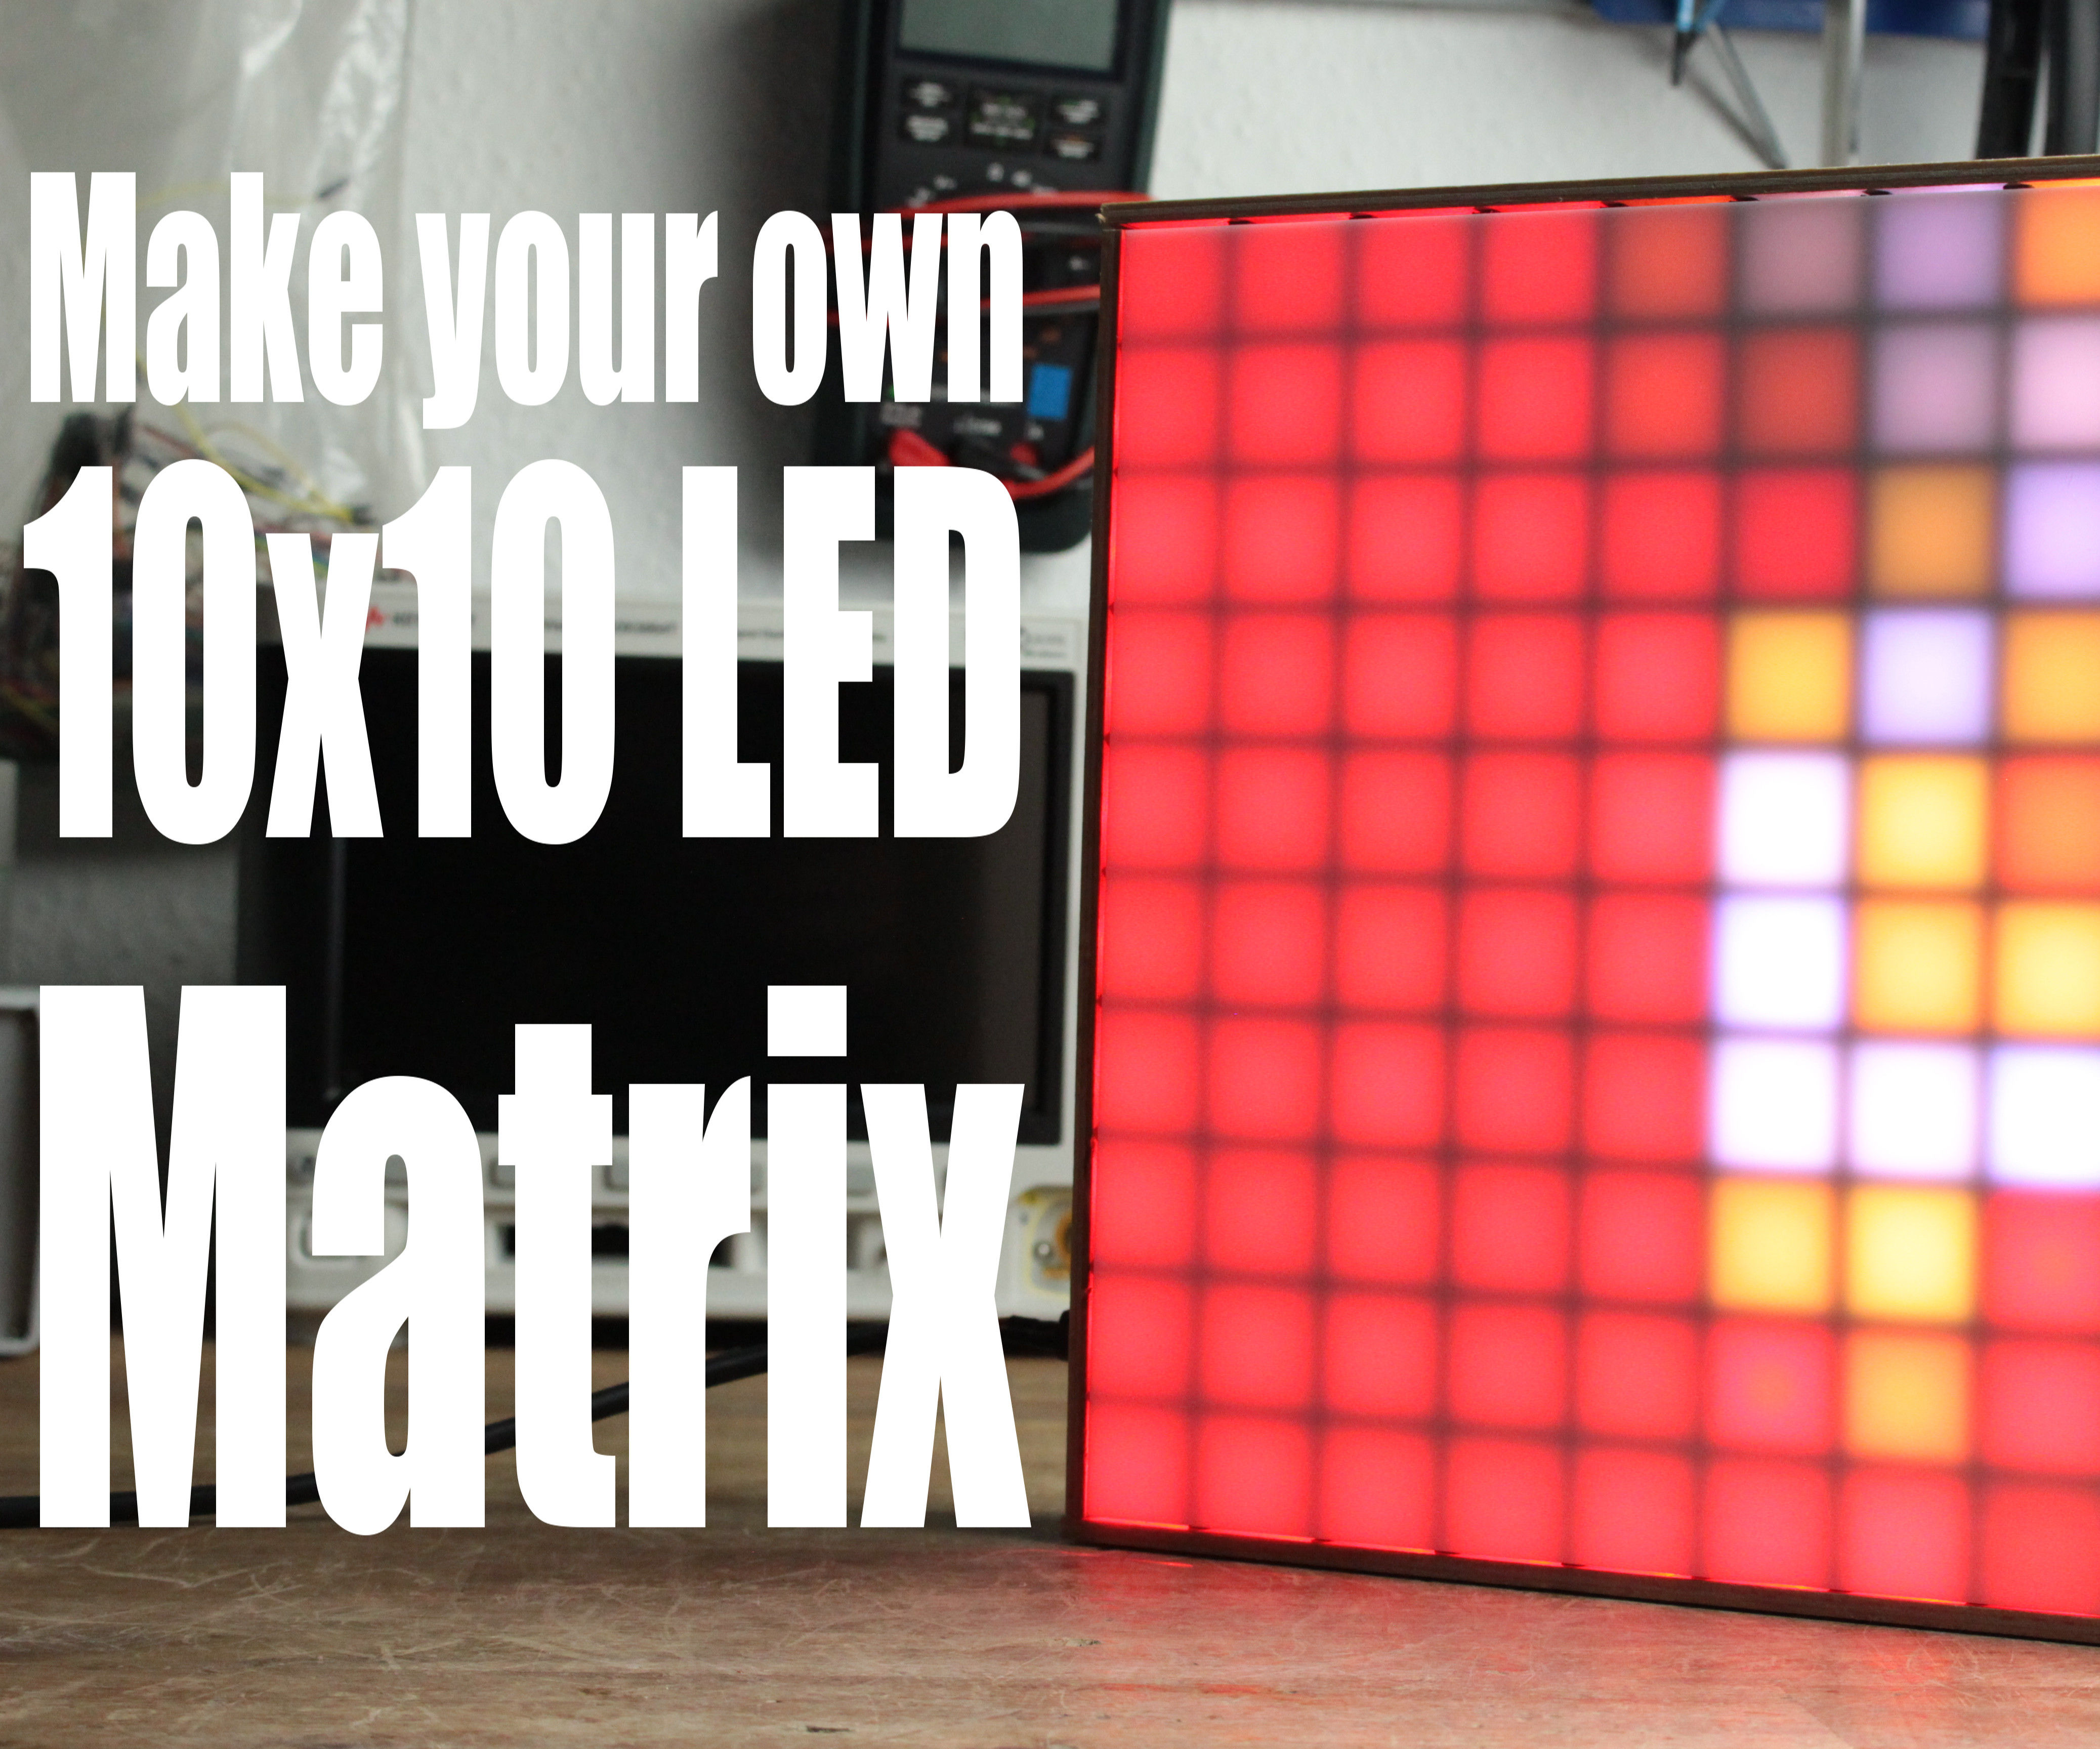 Make your own 10x10 LED Matrix